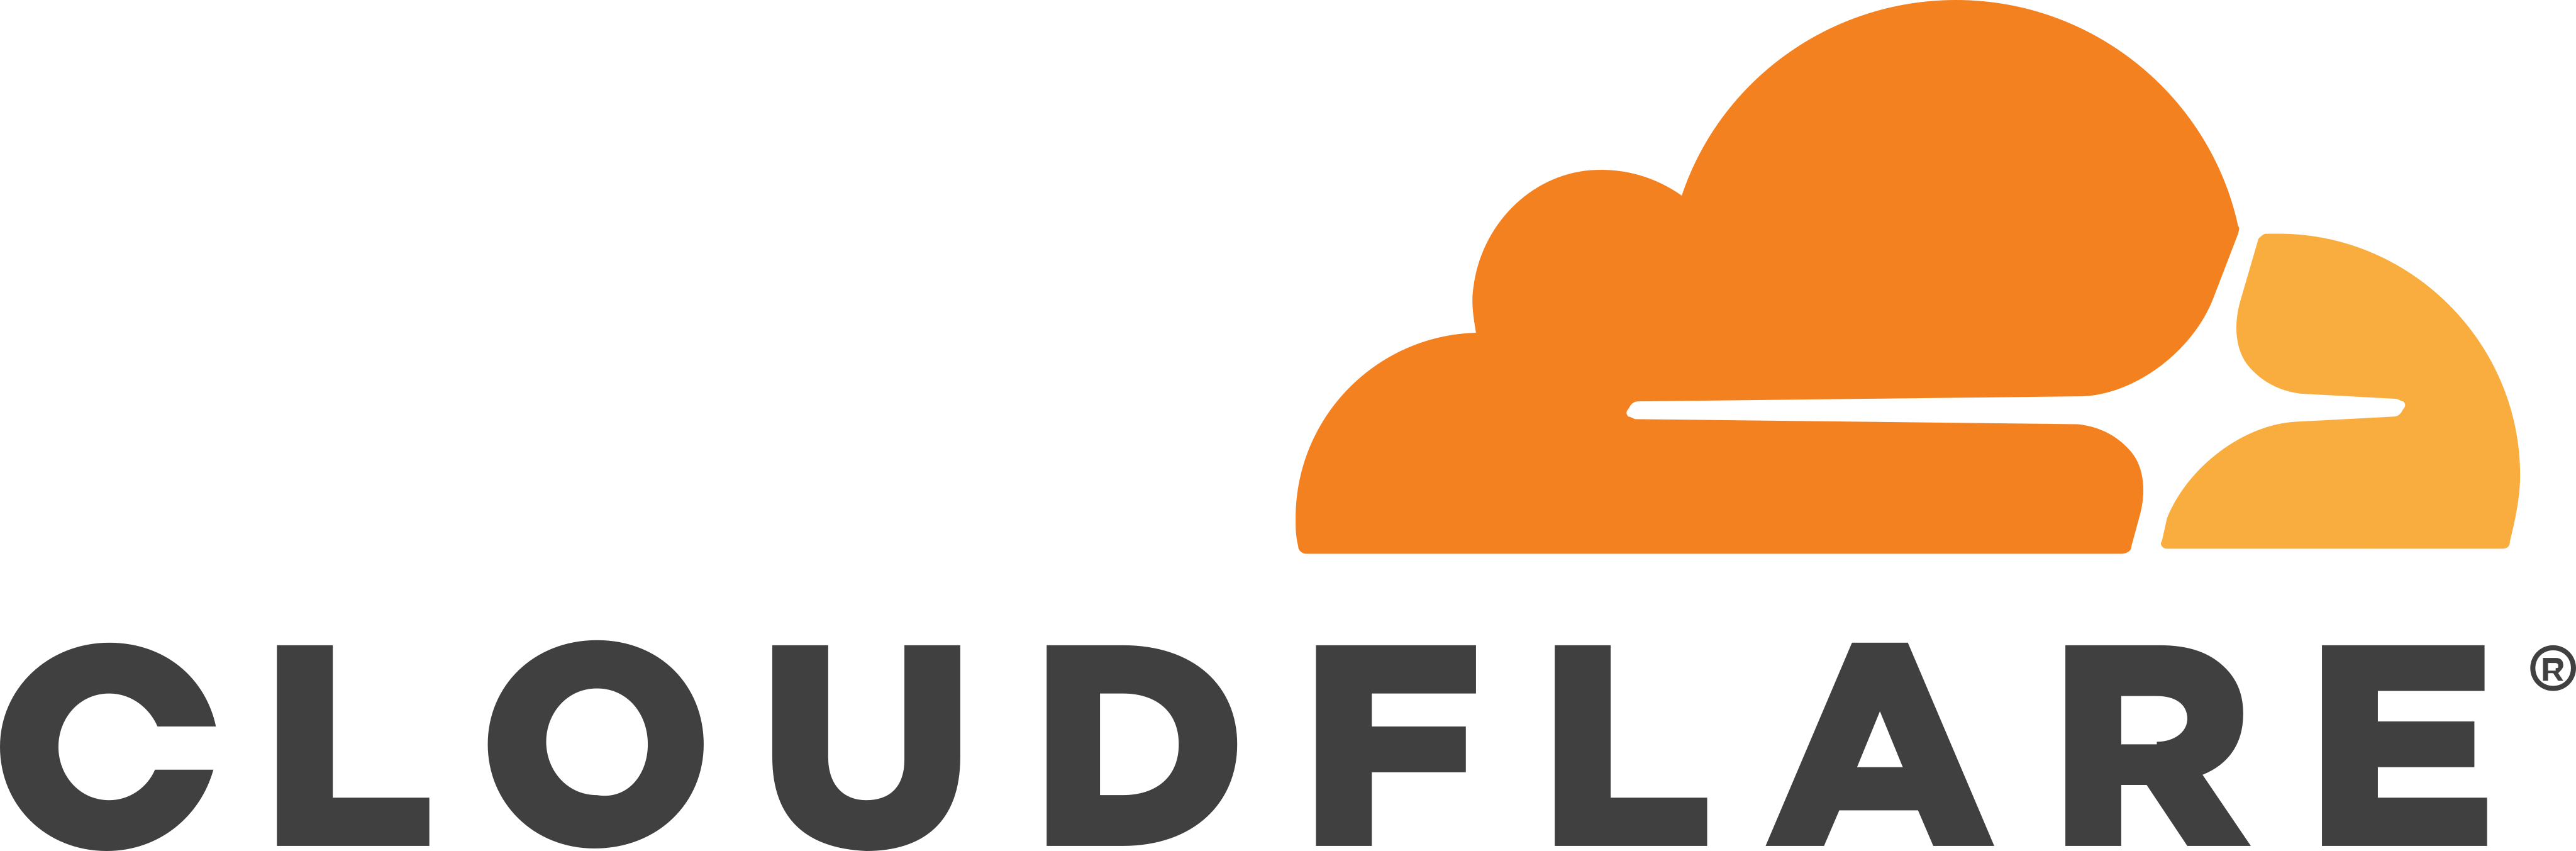 cloudflare logo 7 - Cloudflare Logo